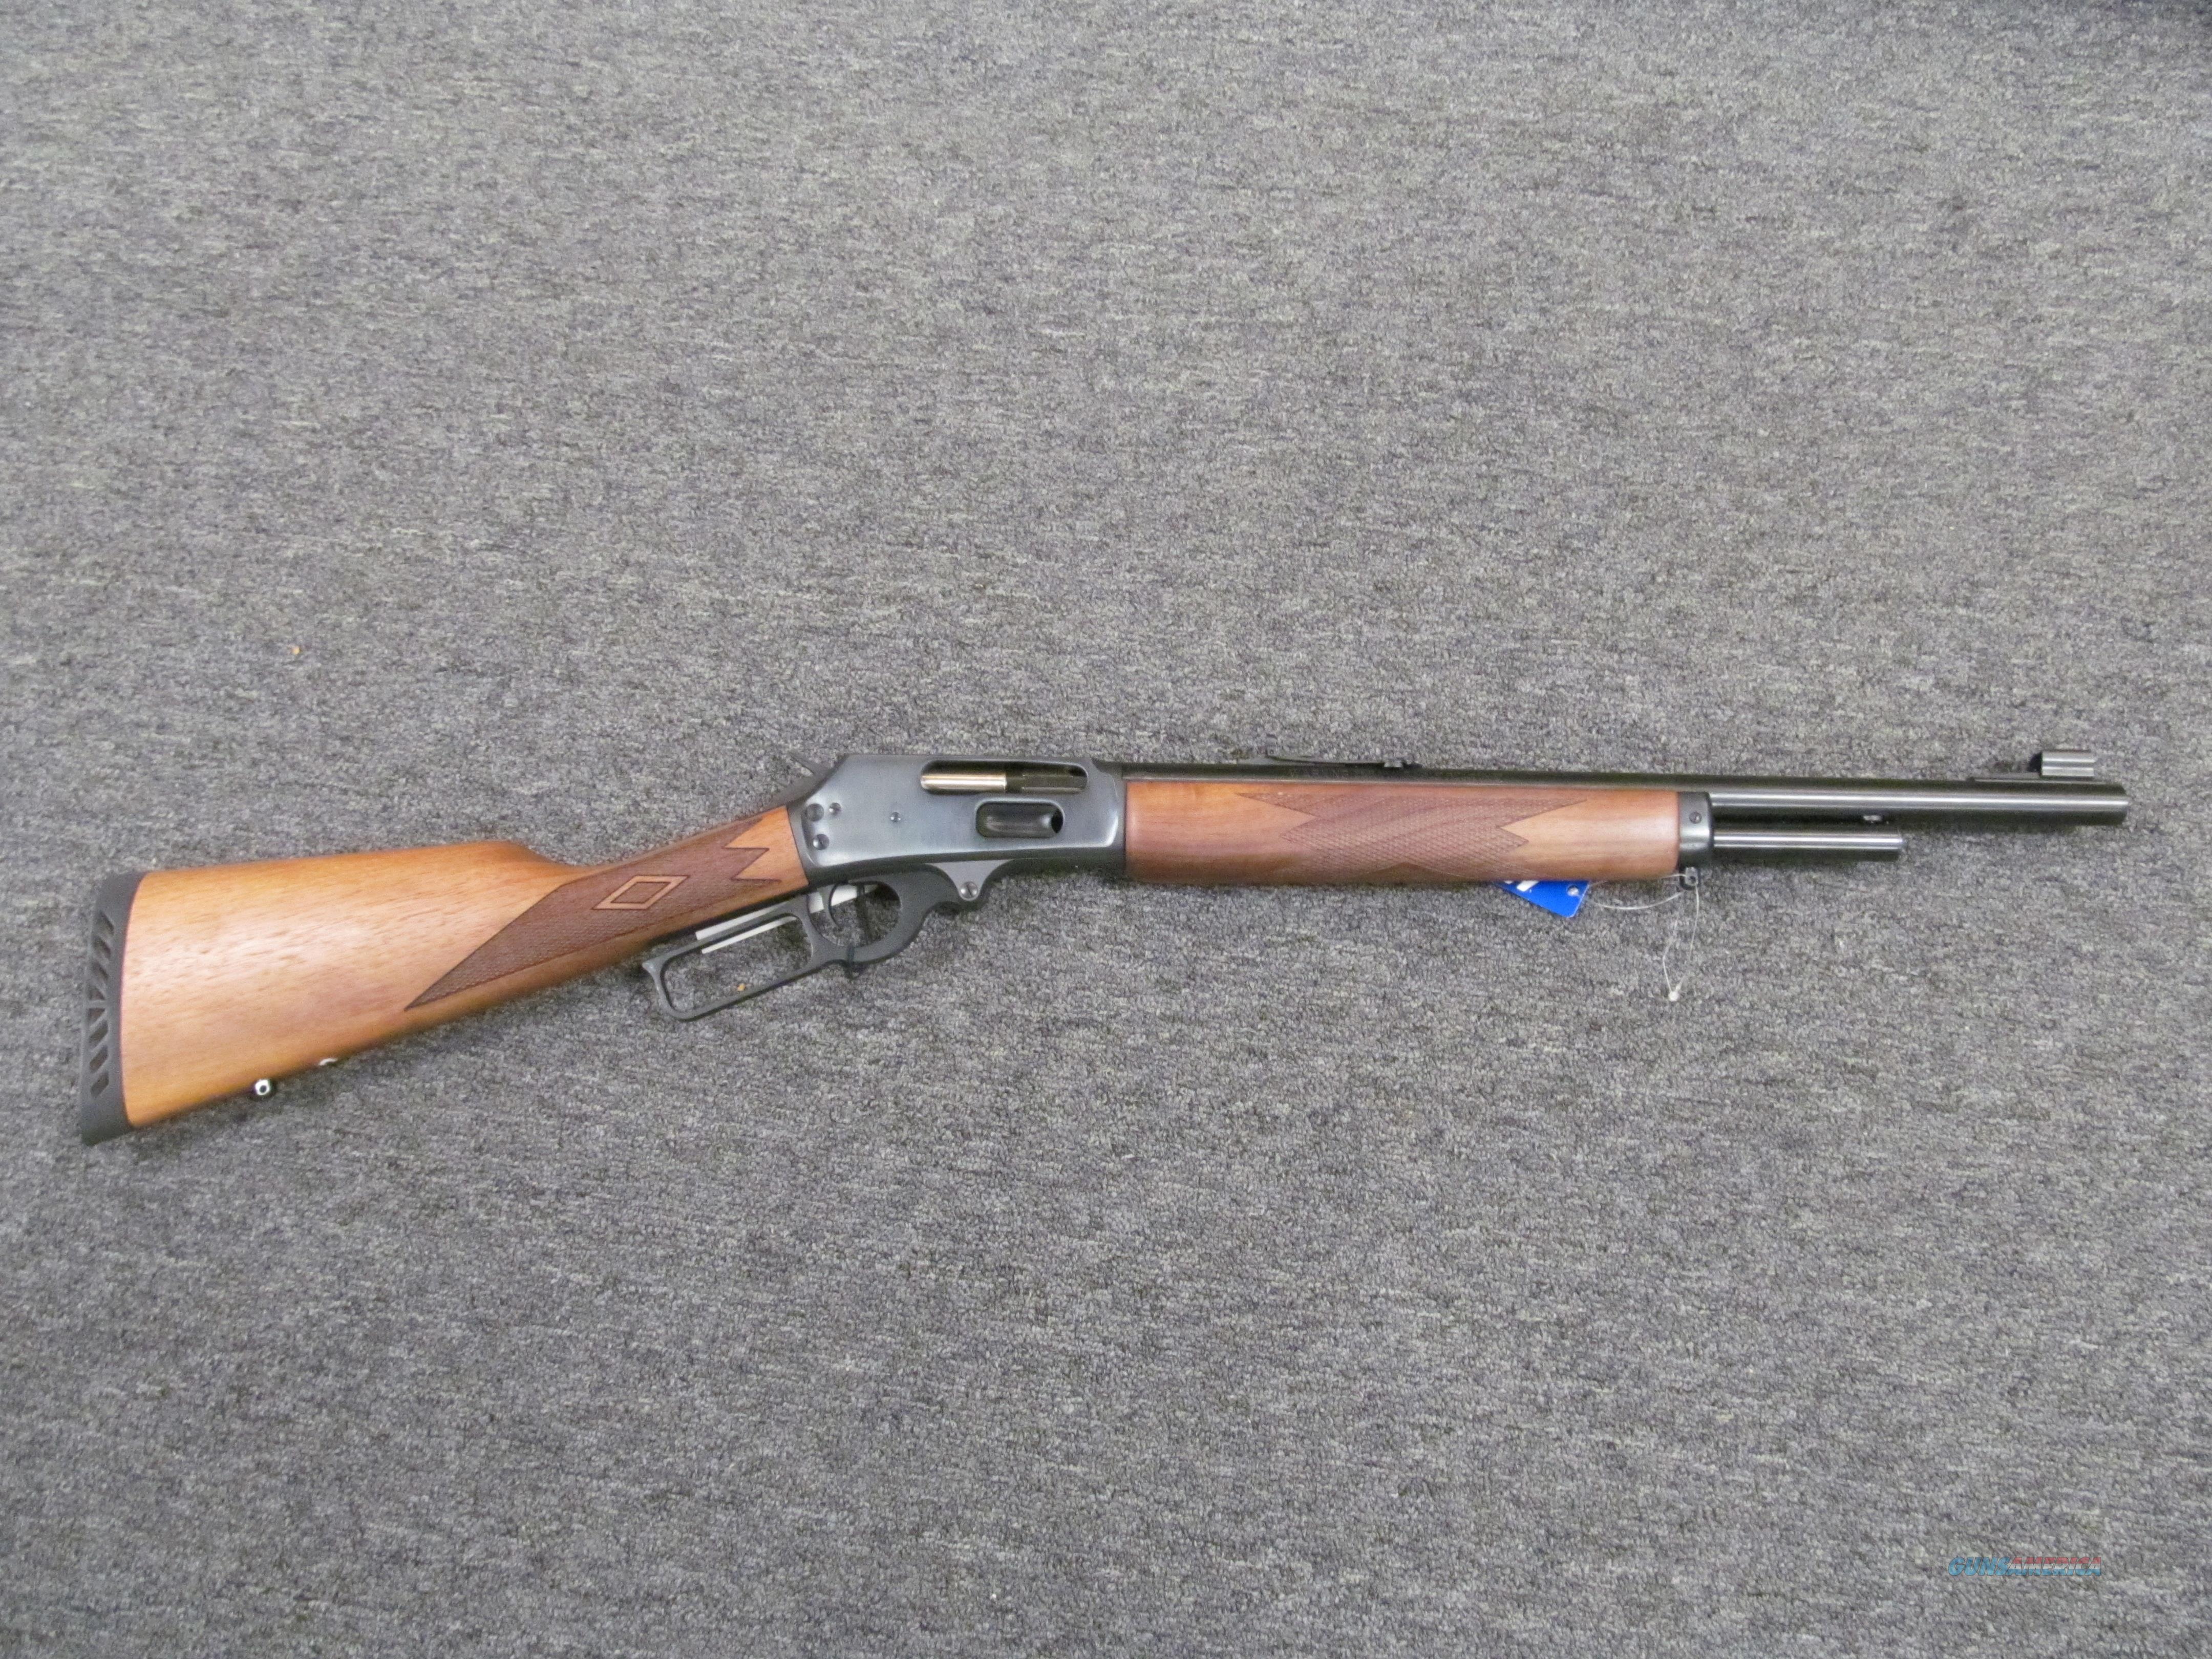 Marlin 1895G (70462)  Guns > Rifles > Marlin Rifles > Modern > Lever Action